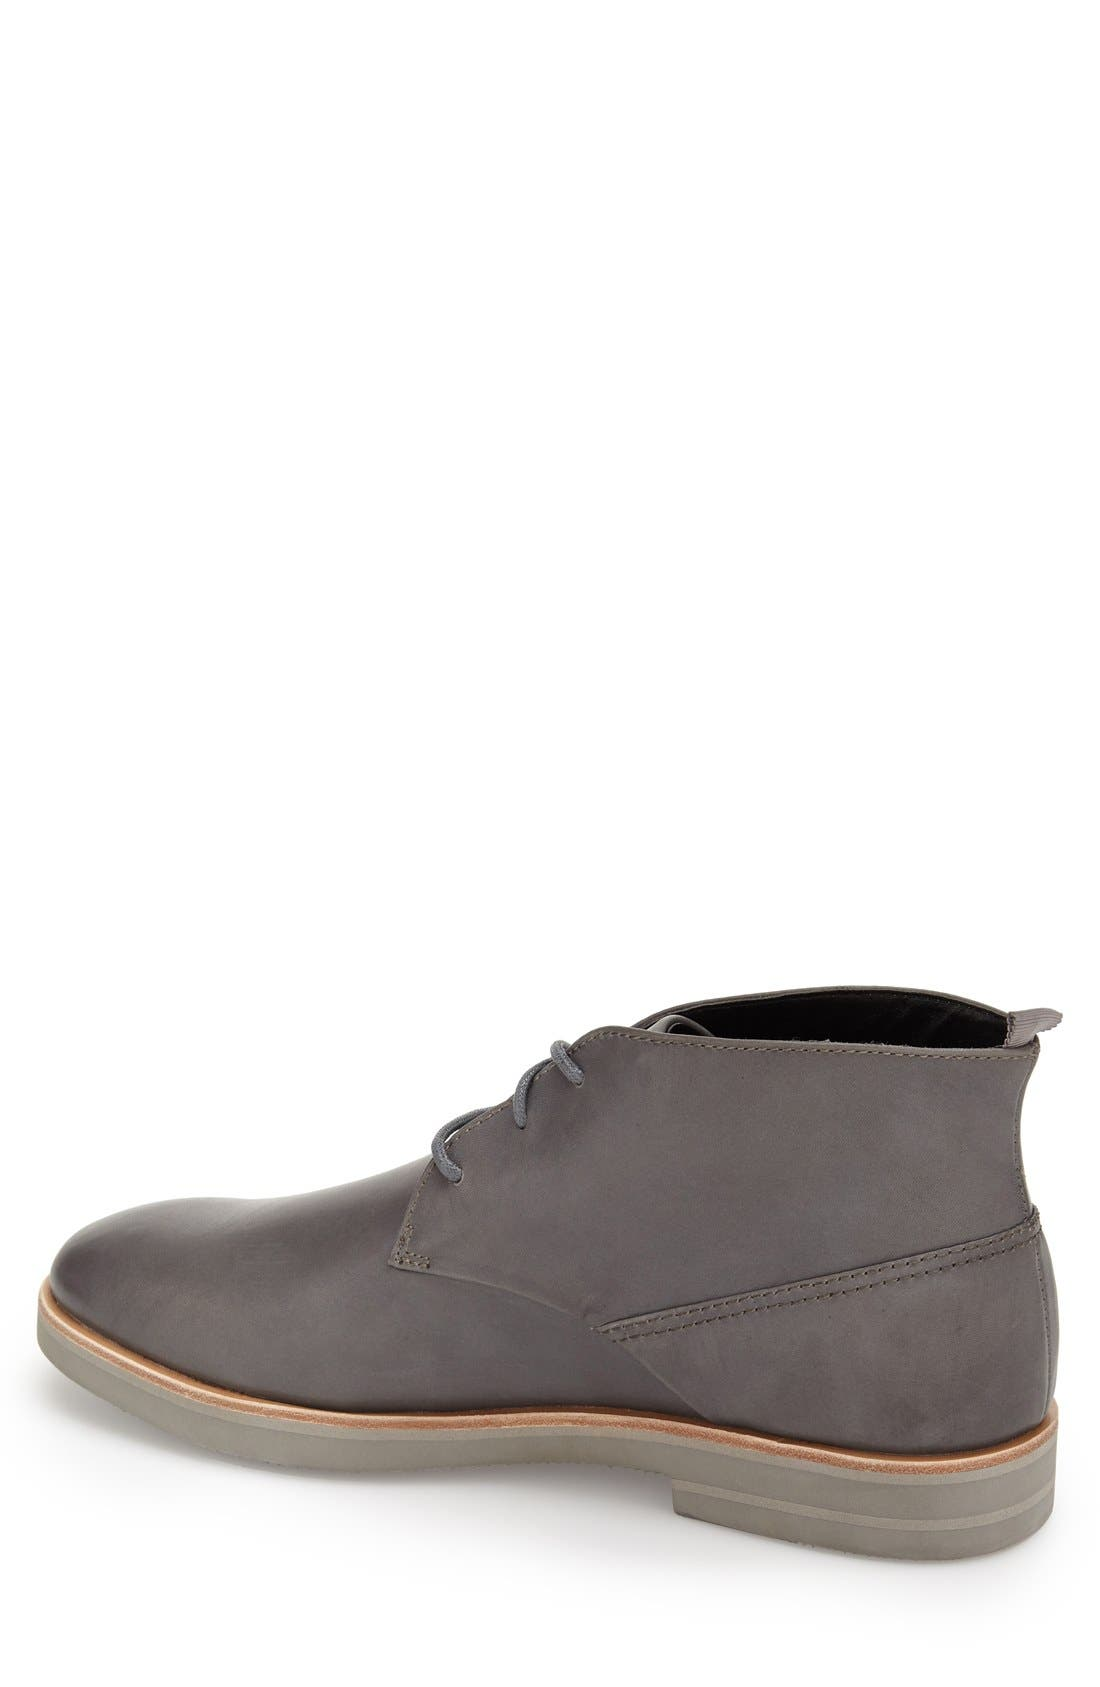 Alternate Image 2  - Calvin Klein 'Walter' Chukka Boot (Men)